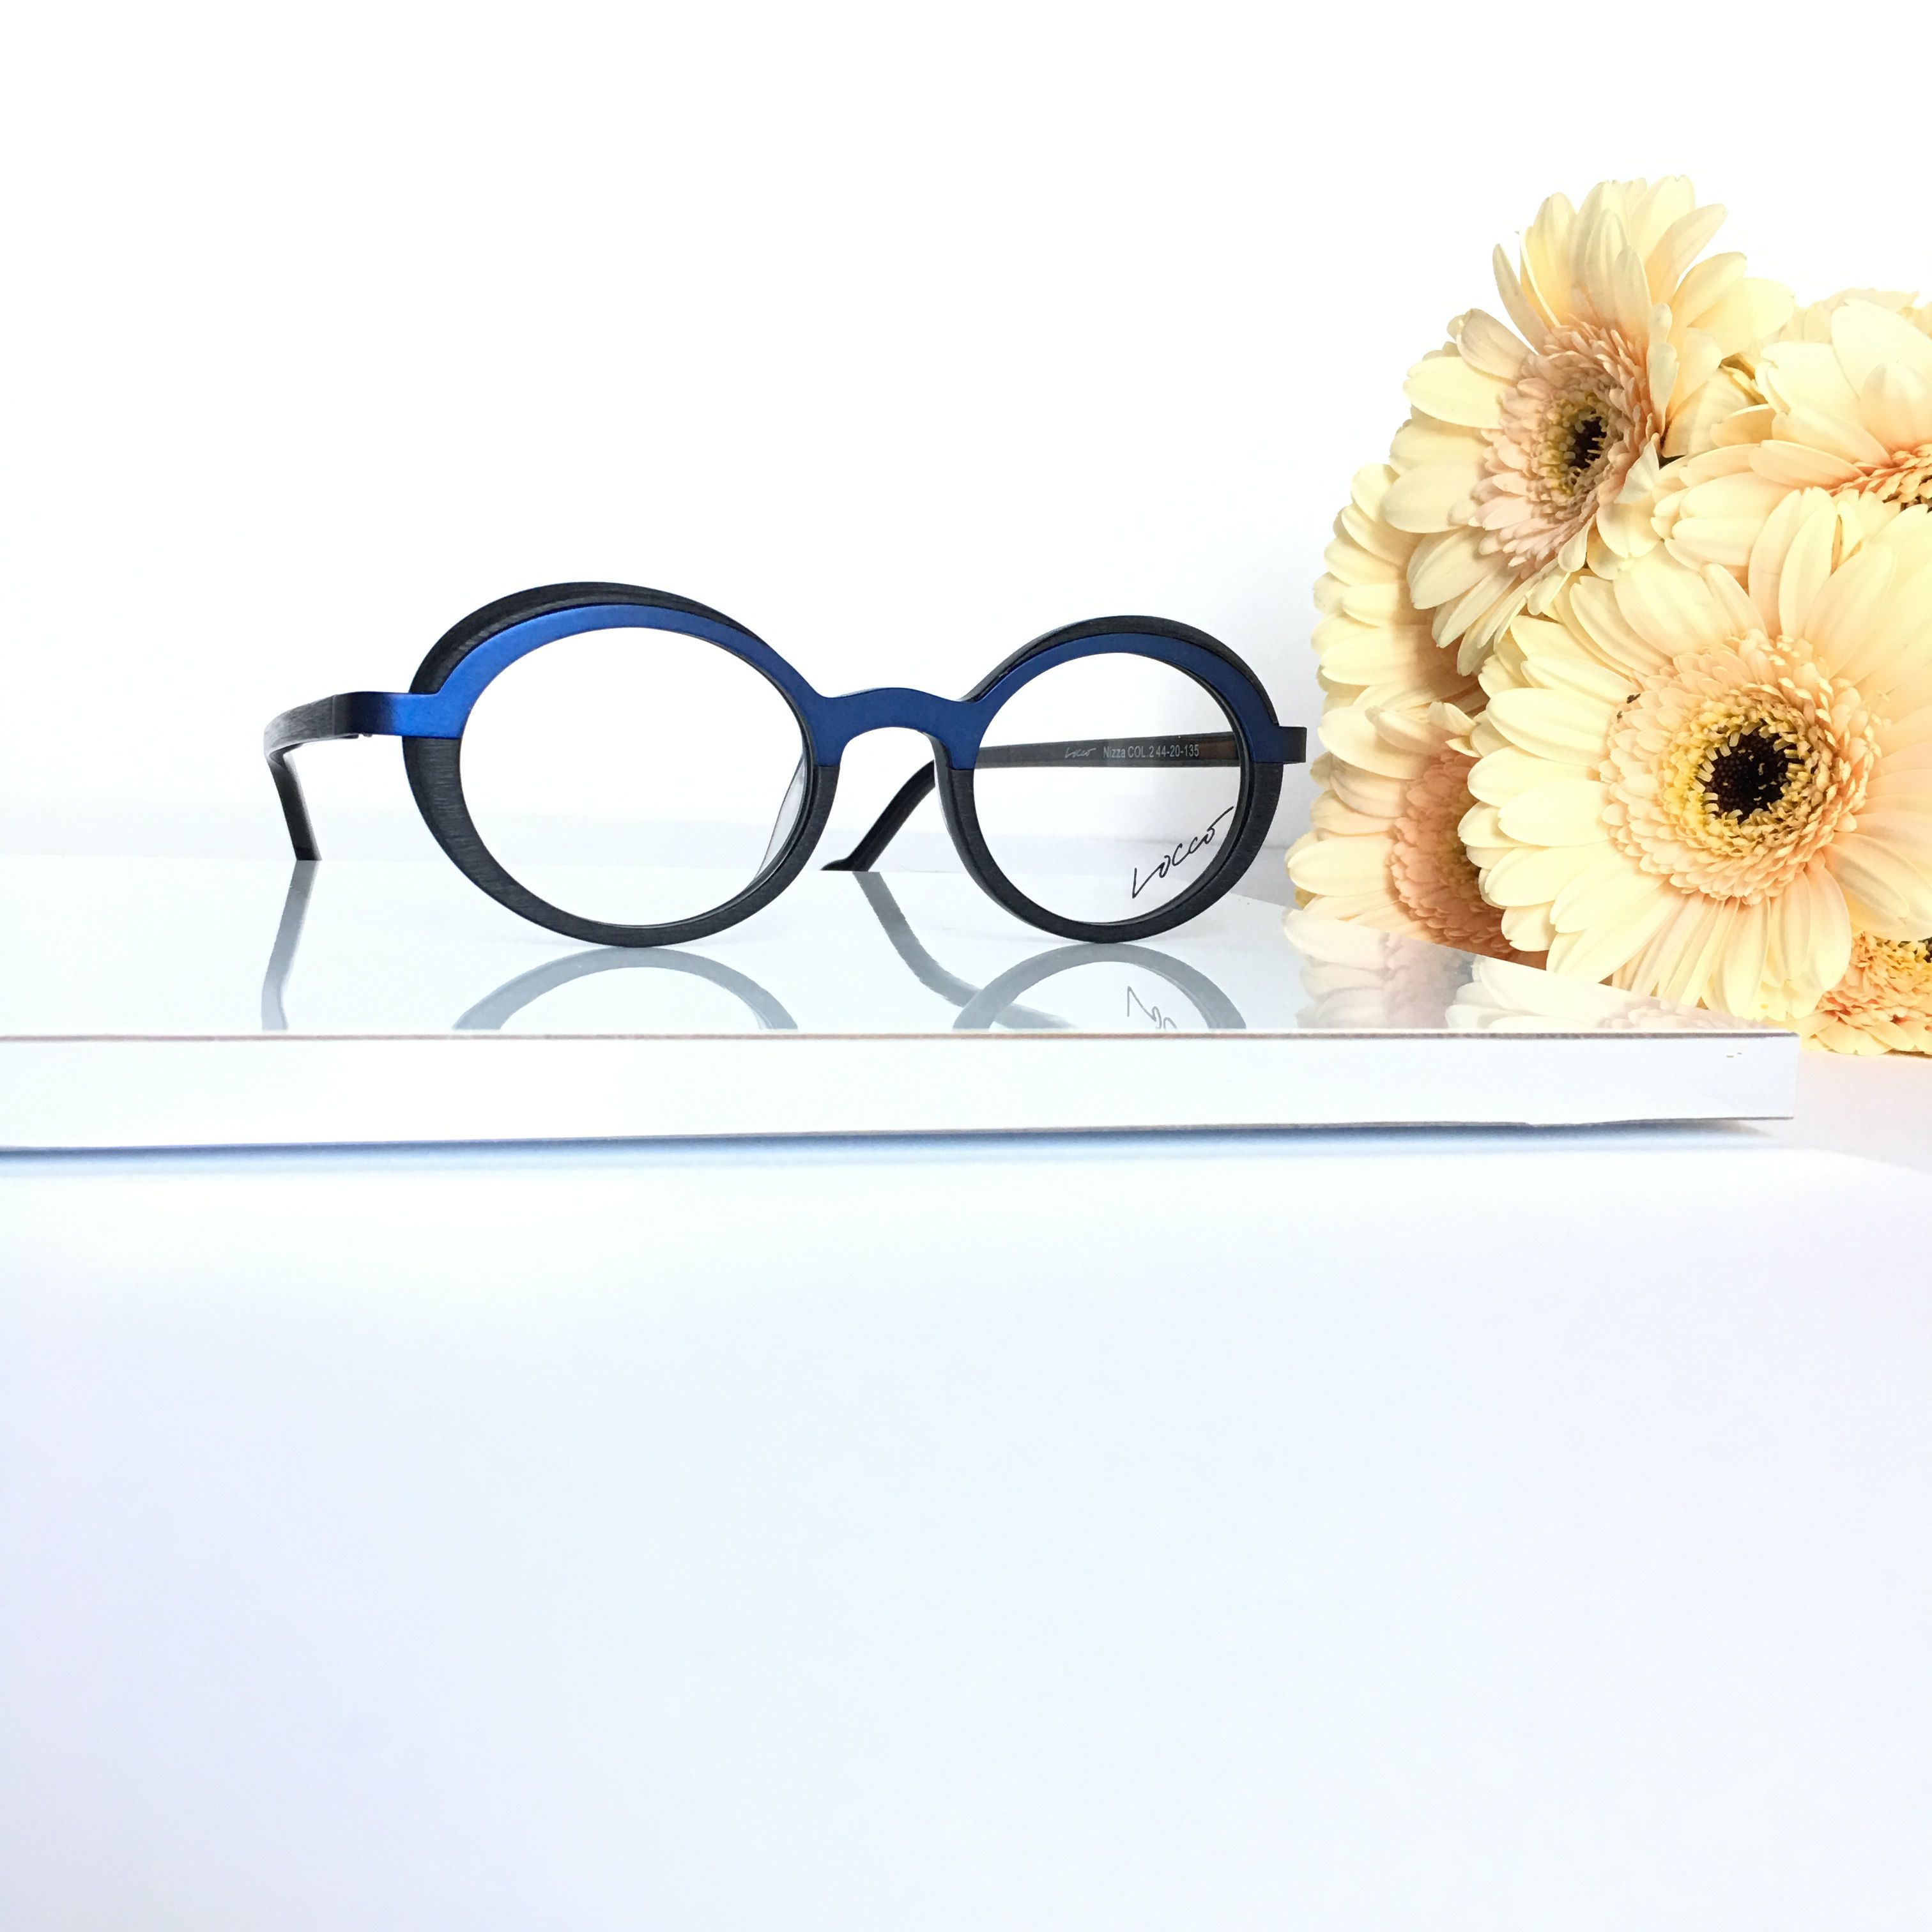 imagens prooptica novas eyewear campanha jaguar de apresenta